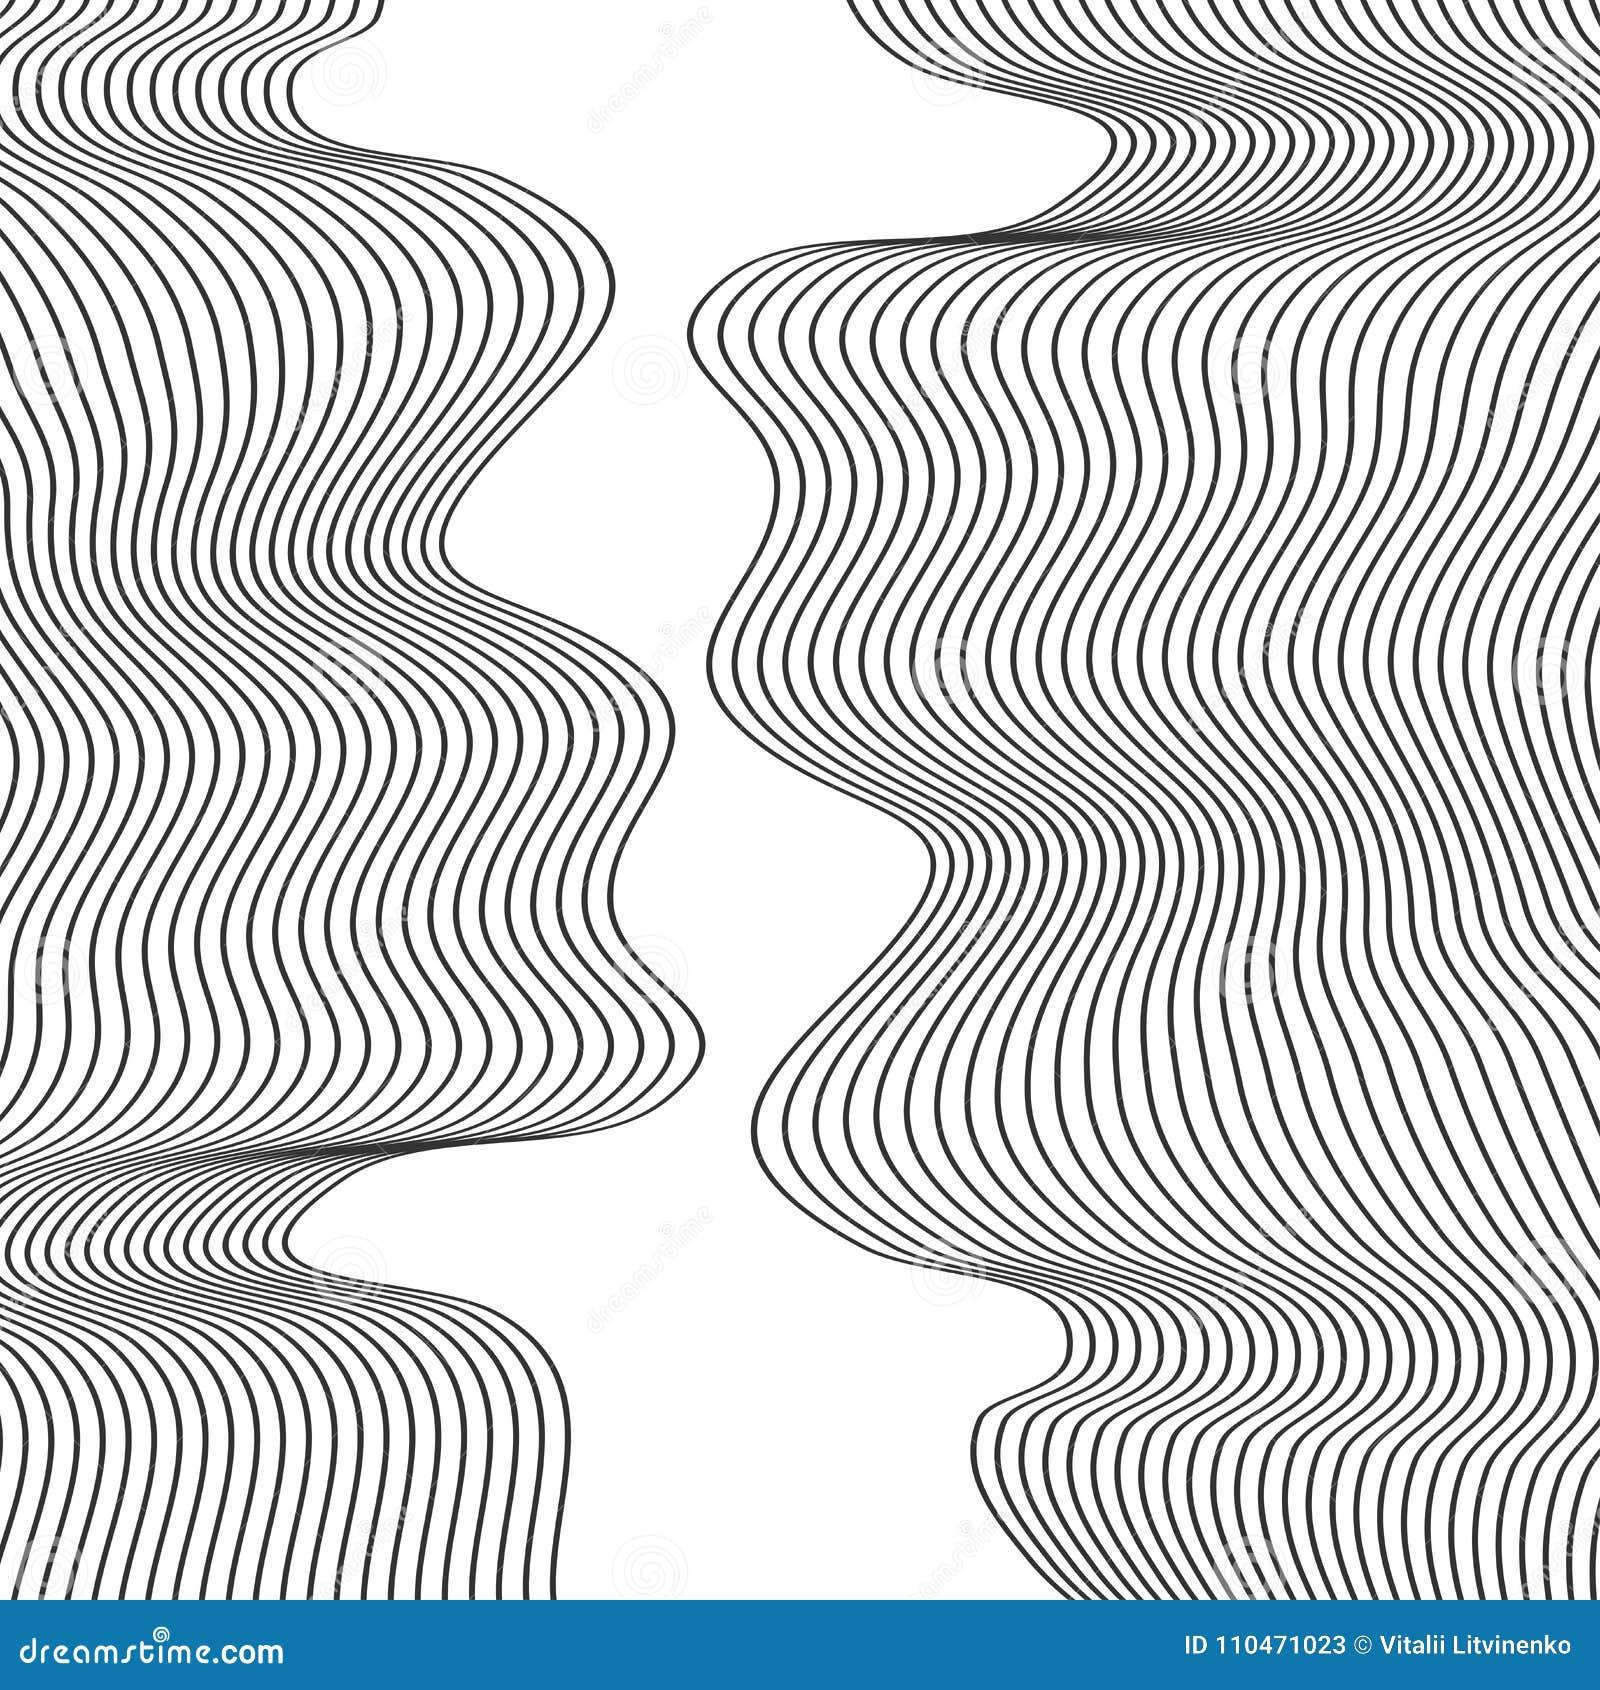 Abstract Design Line Art